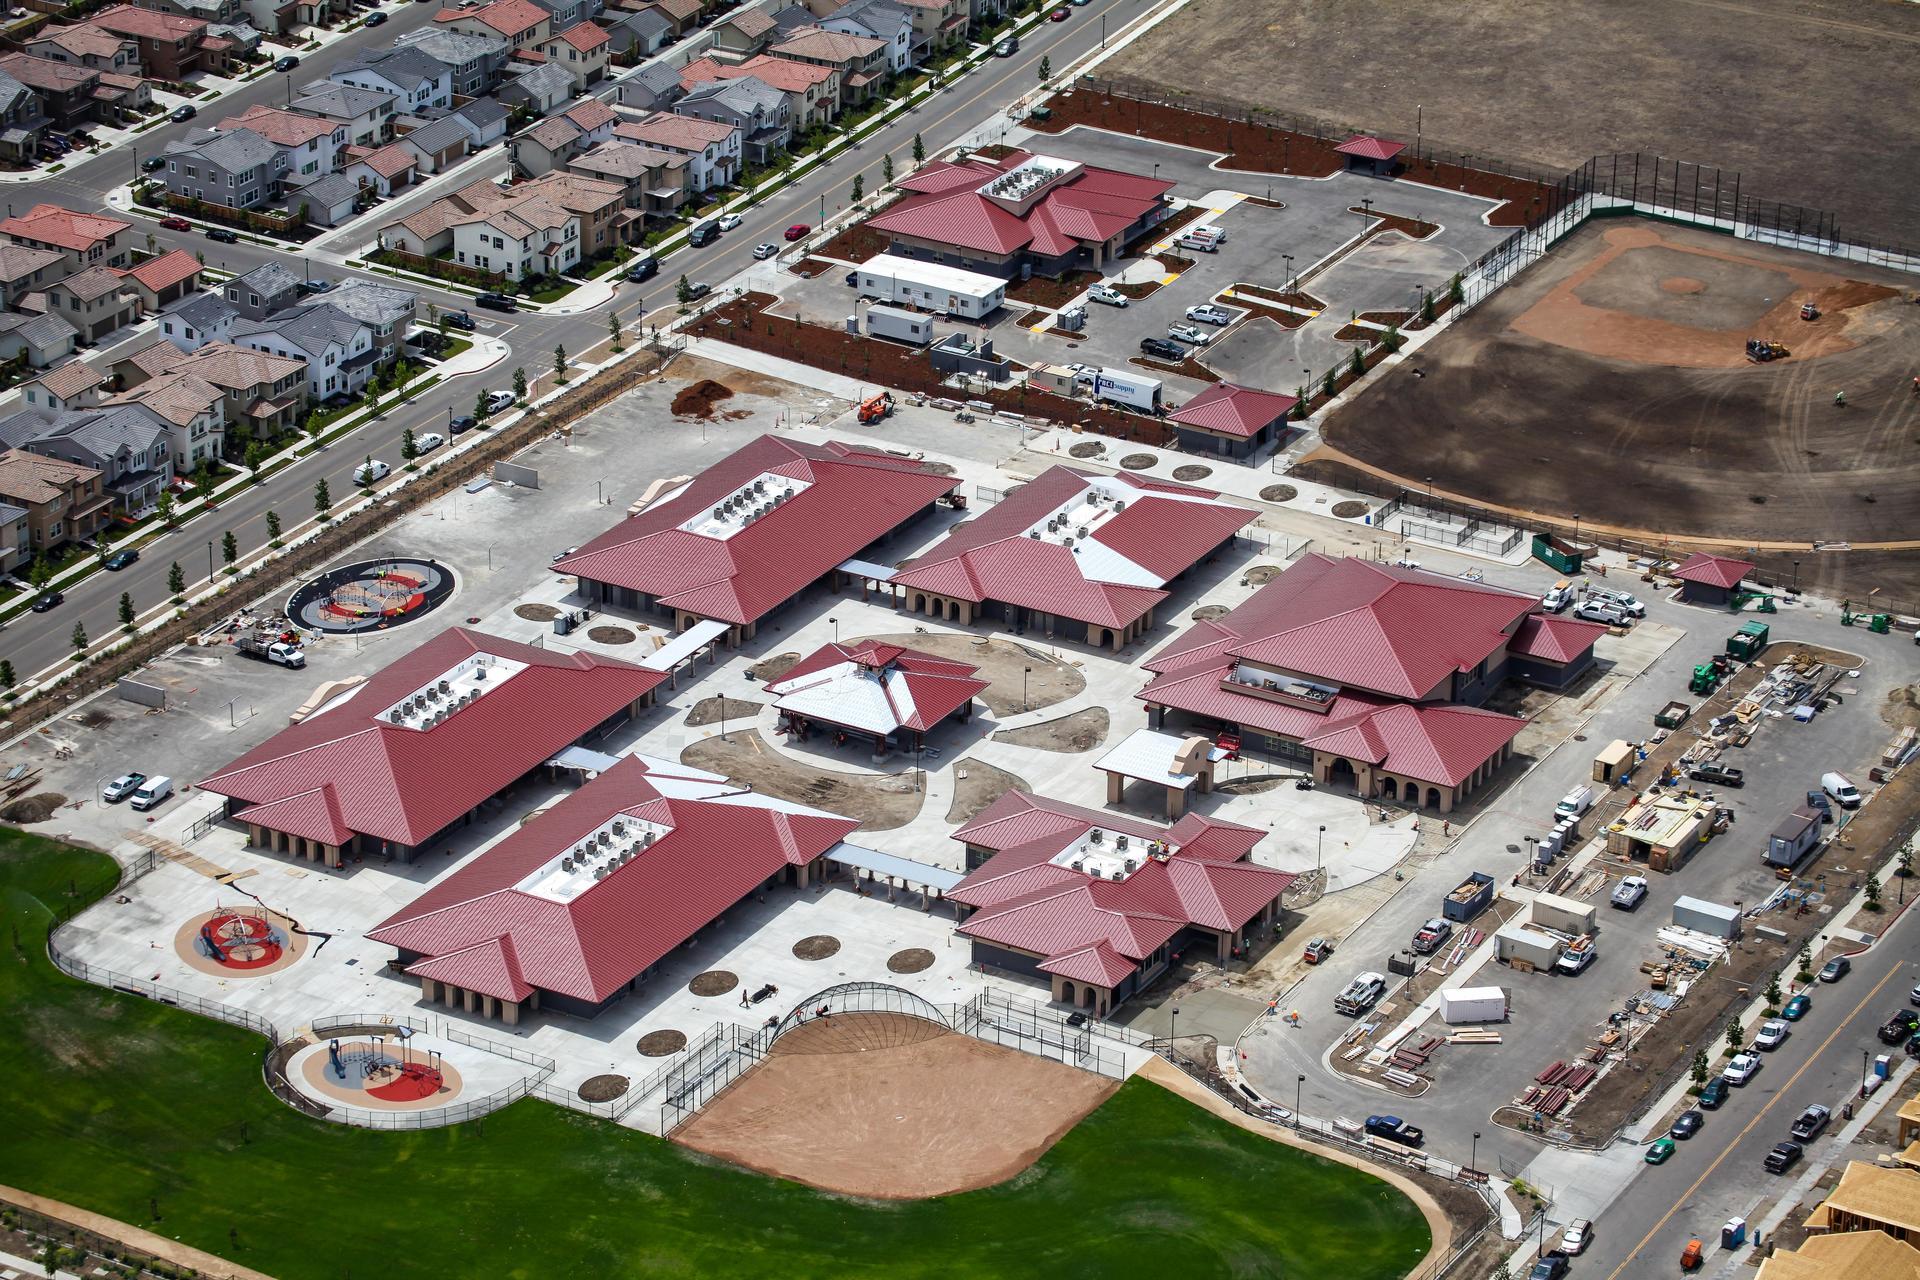 Cordes Elementary School Aerial April 2020